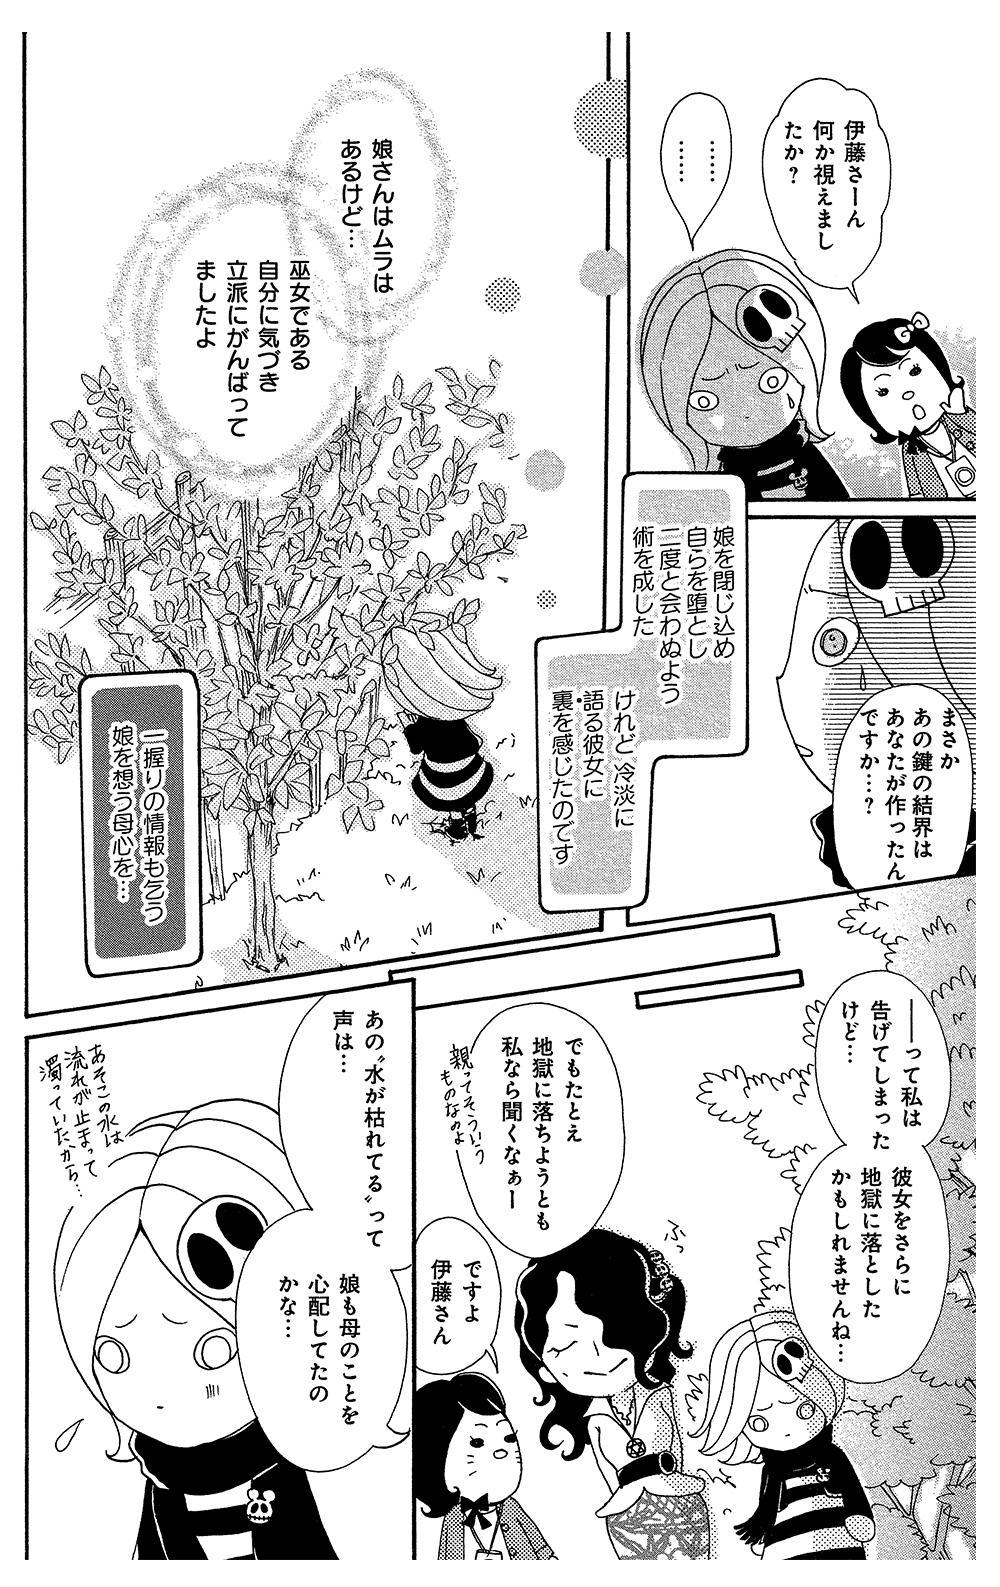 スピ☆散歩 第2話「清正井と明治神宮」②spsanp04-07.jpg